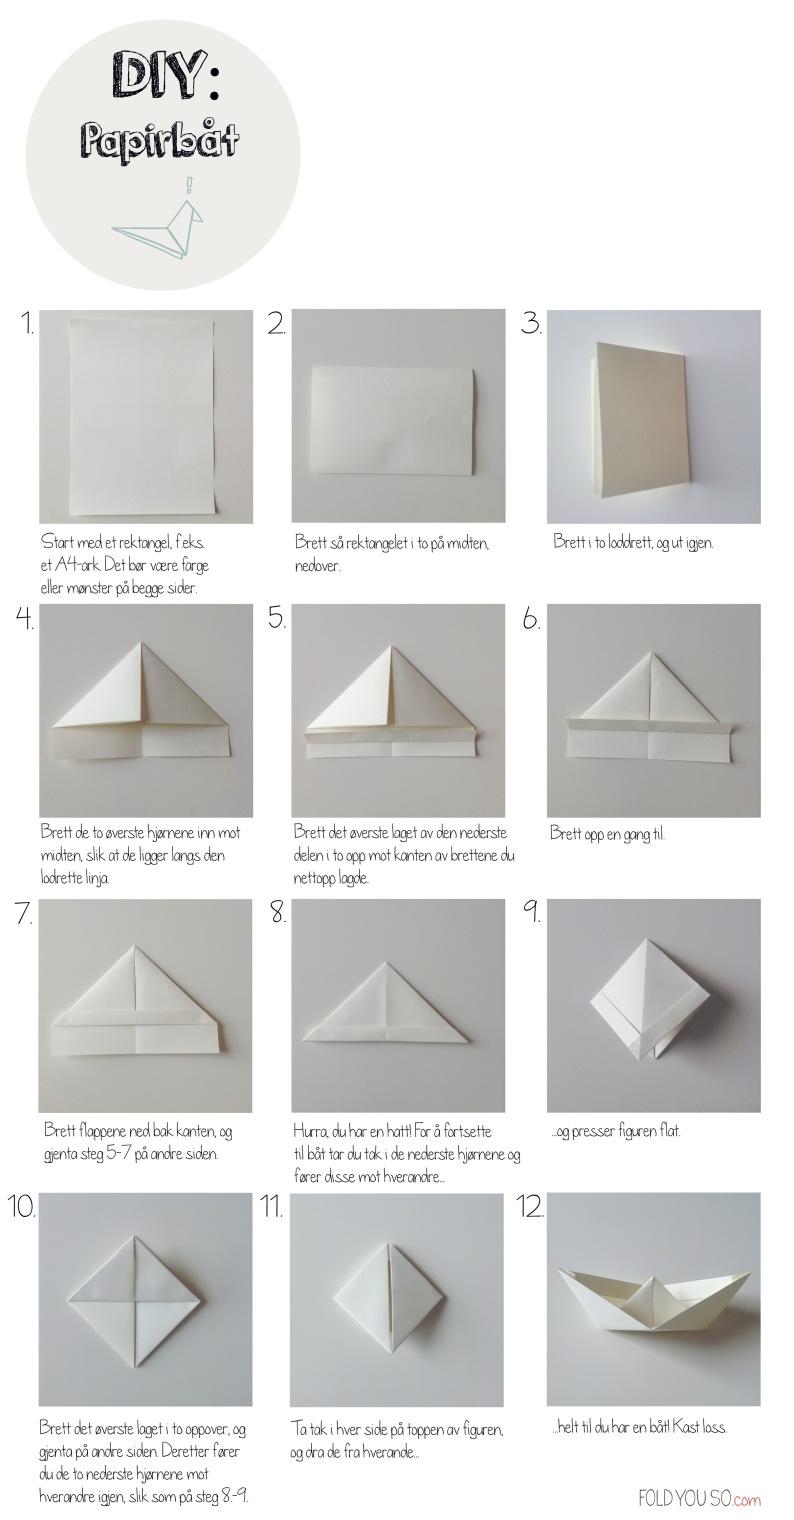 DIY-Papirbaat fra foldyouso.com